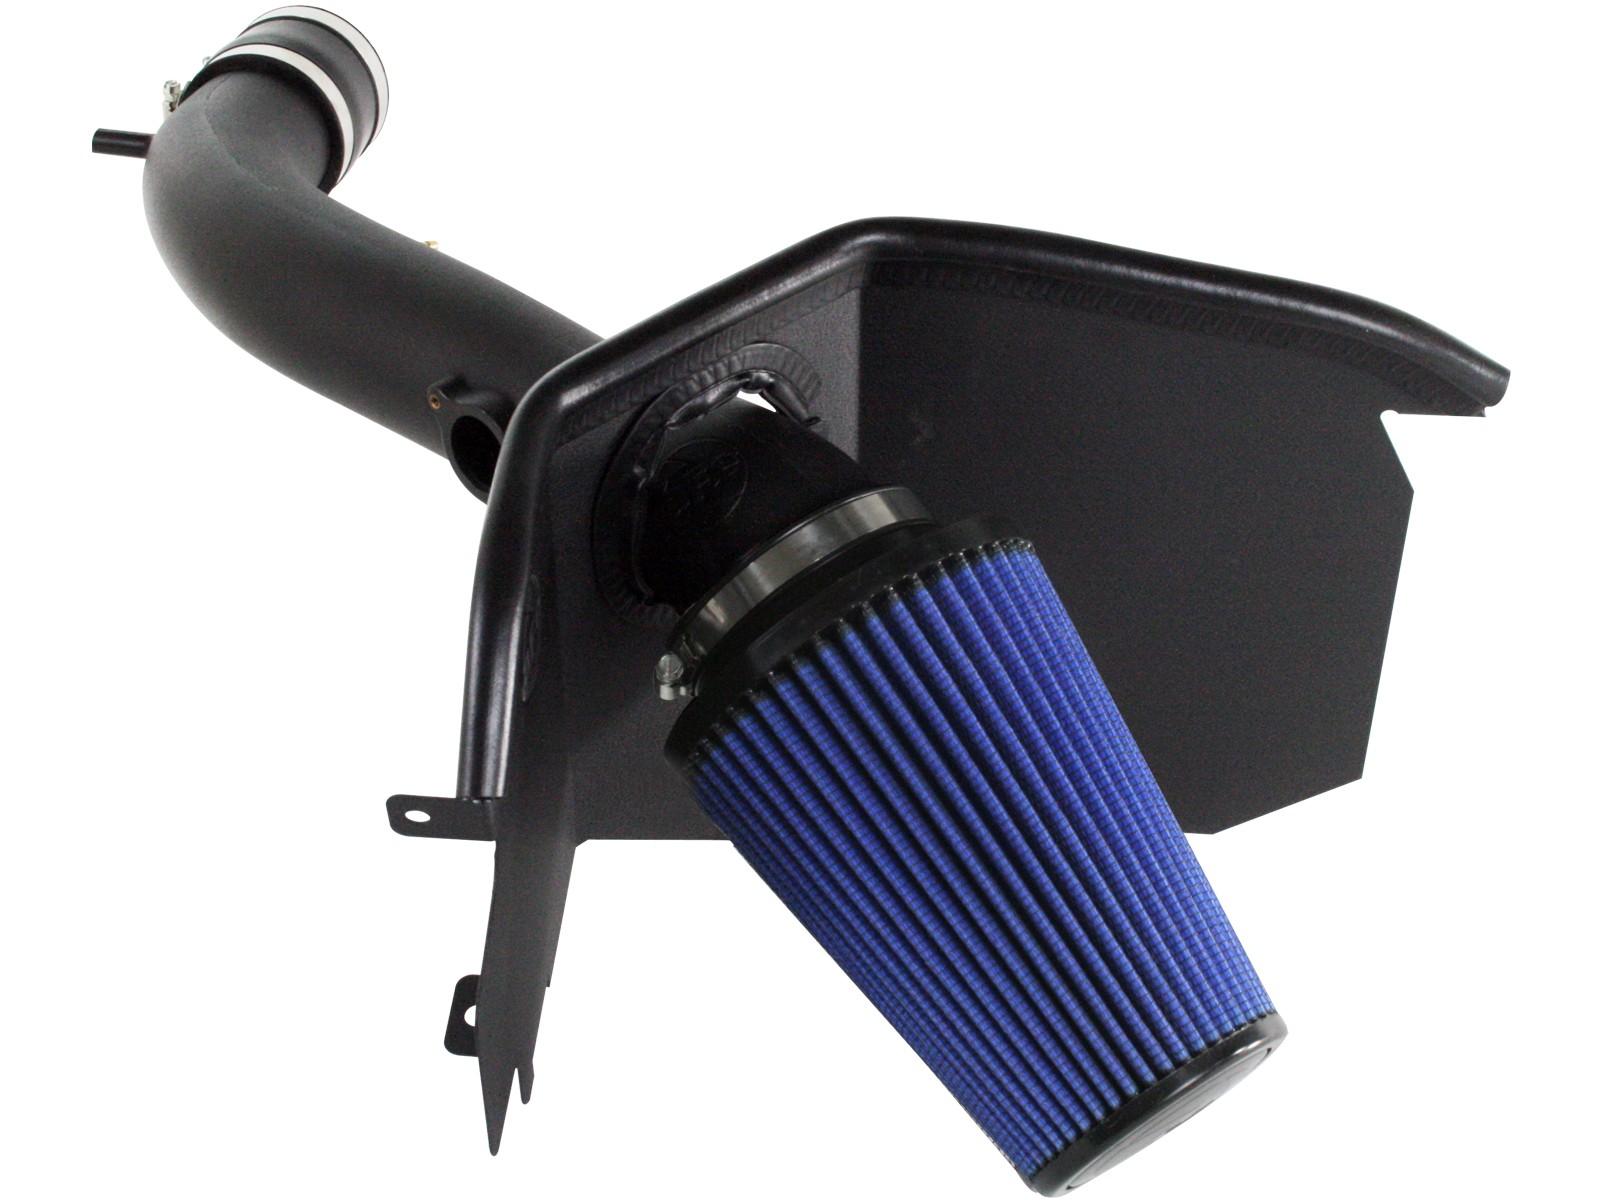 AIR INTAKE FILTER FOR 99-04 TACOMA 99-02 4RUNNER V6 3.4L